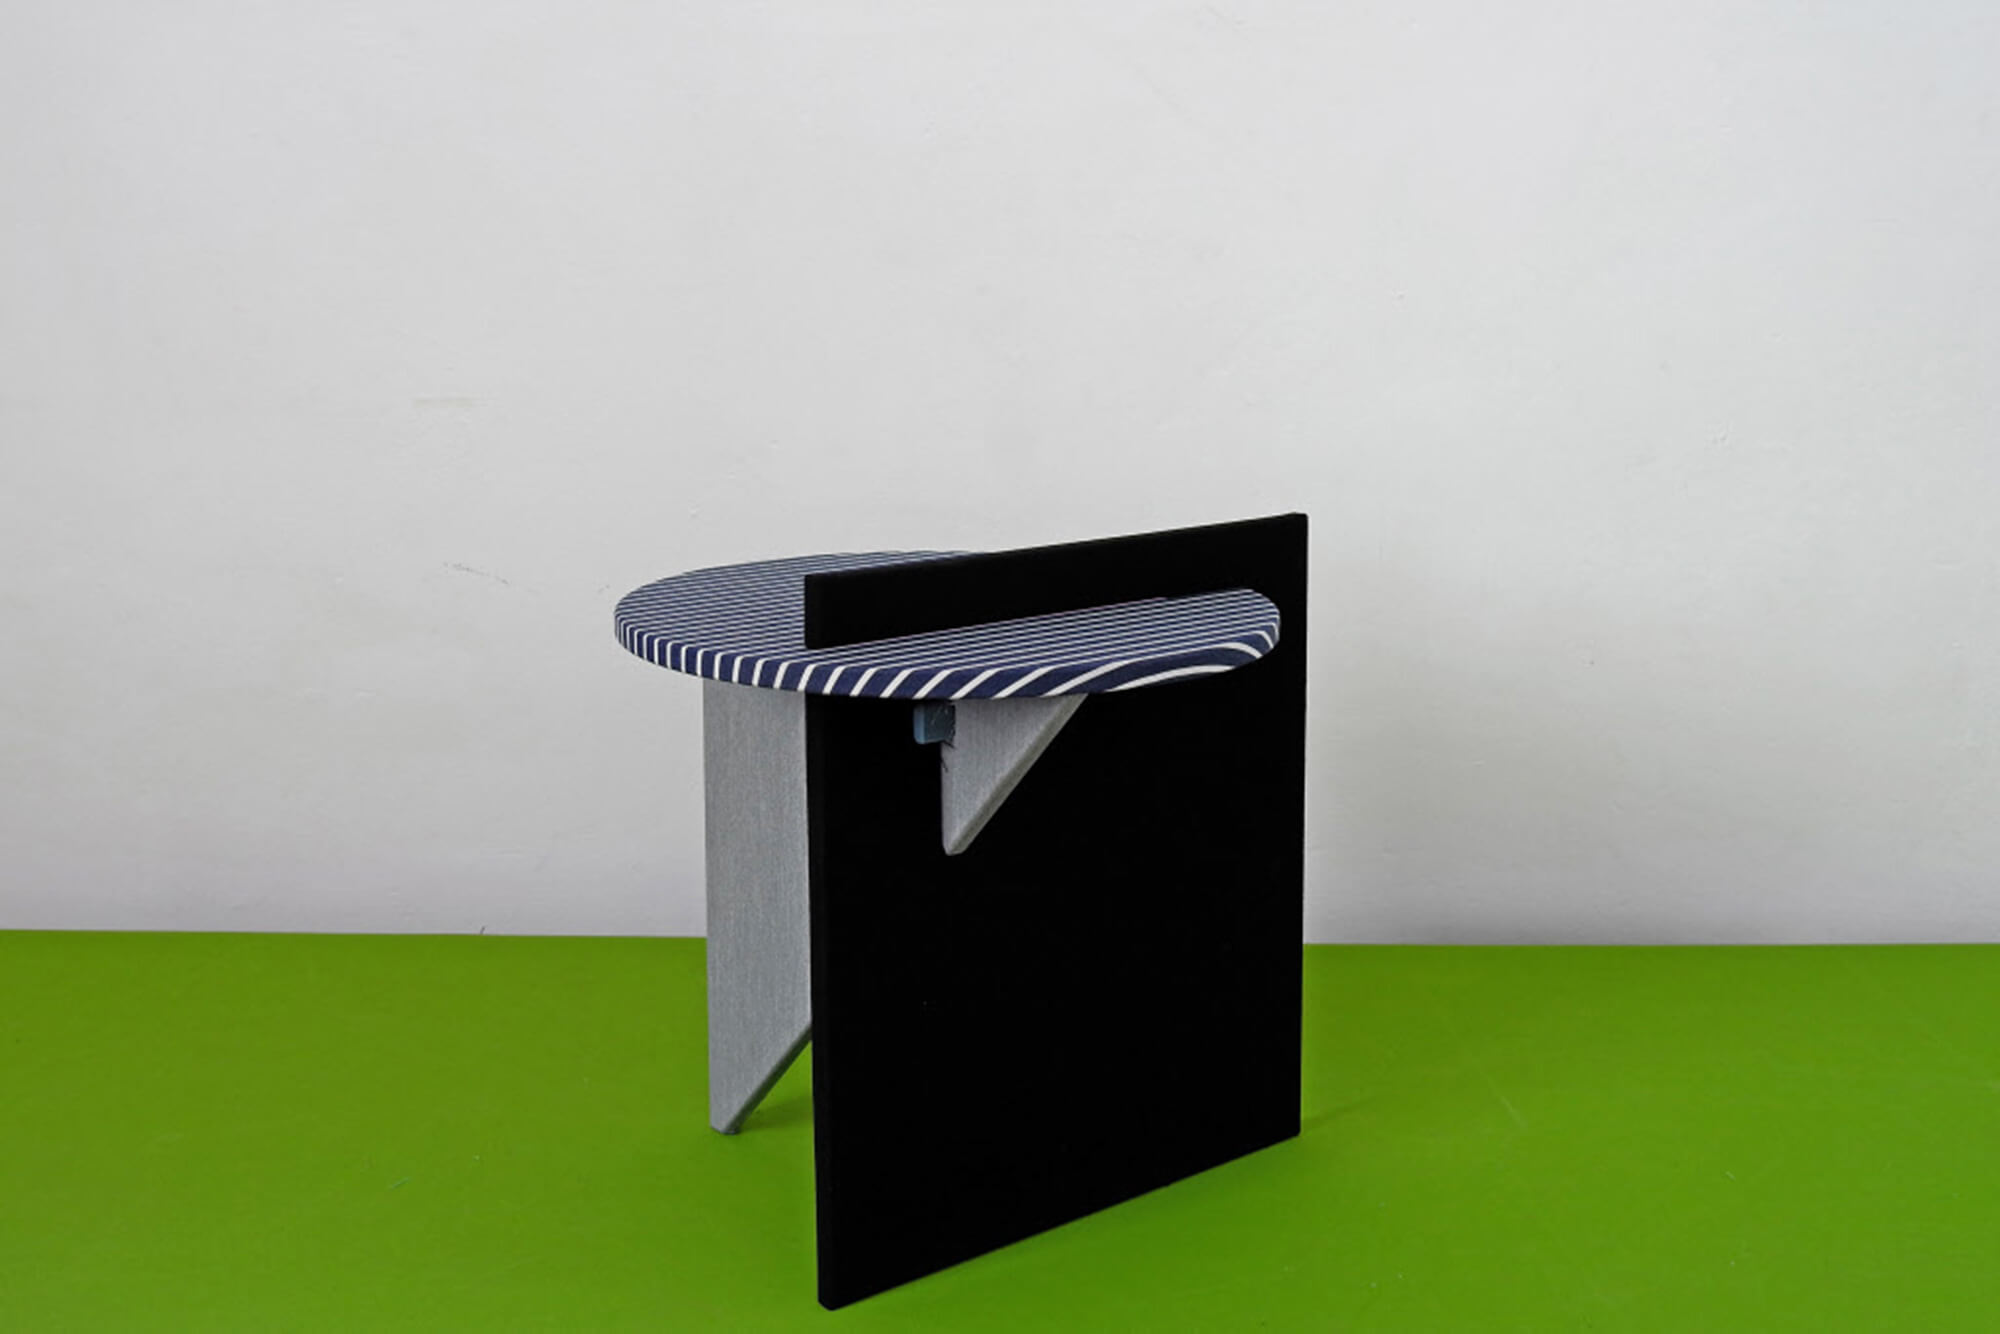 Rosana Orlandi 美术馆里 Atelier Lavit 设计的黑色与海军蓝色边桌